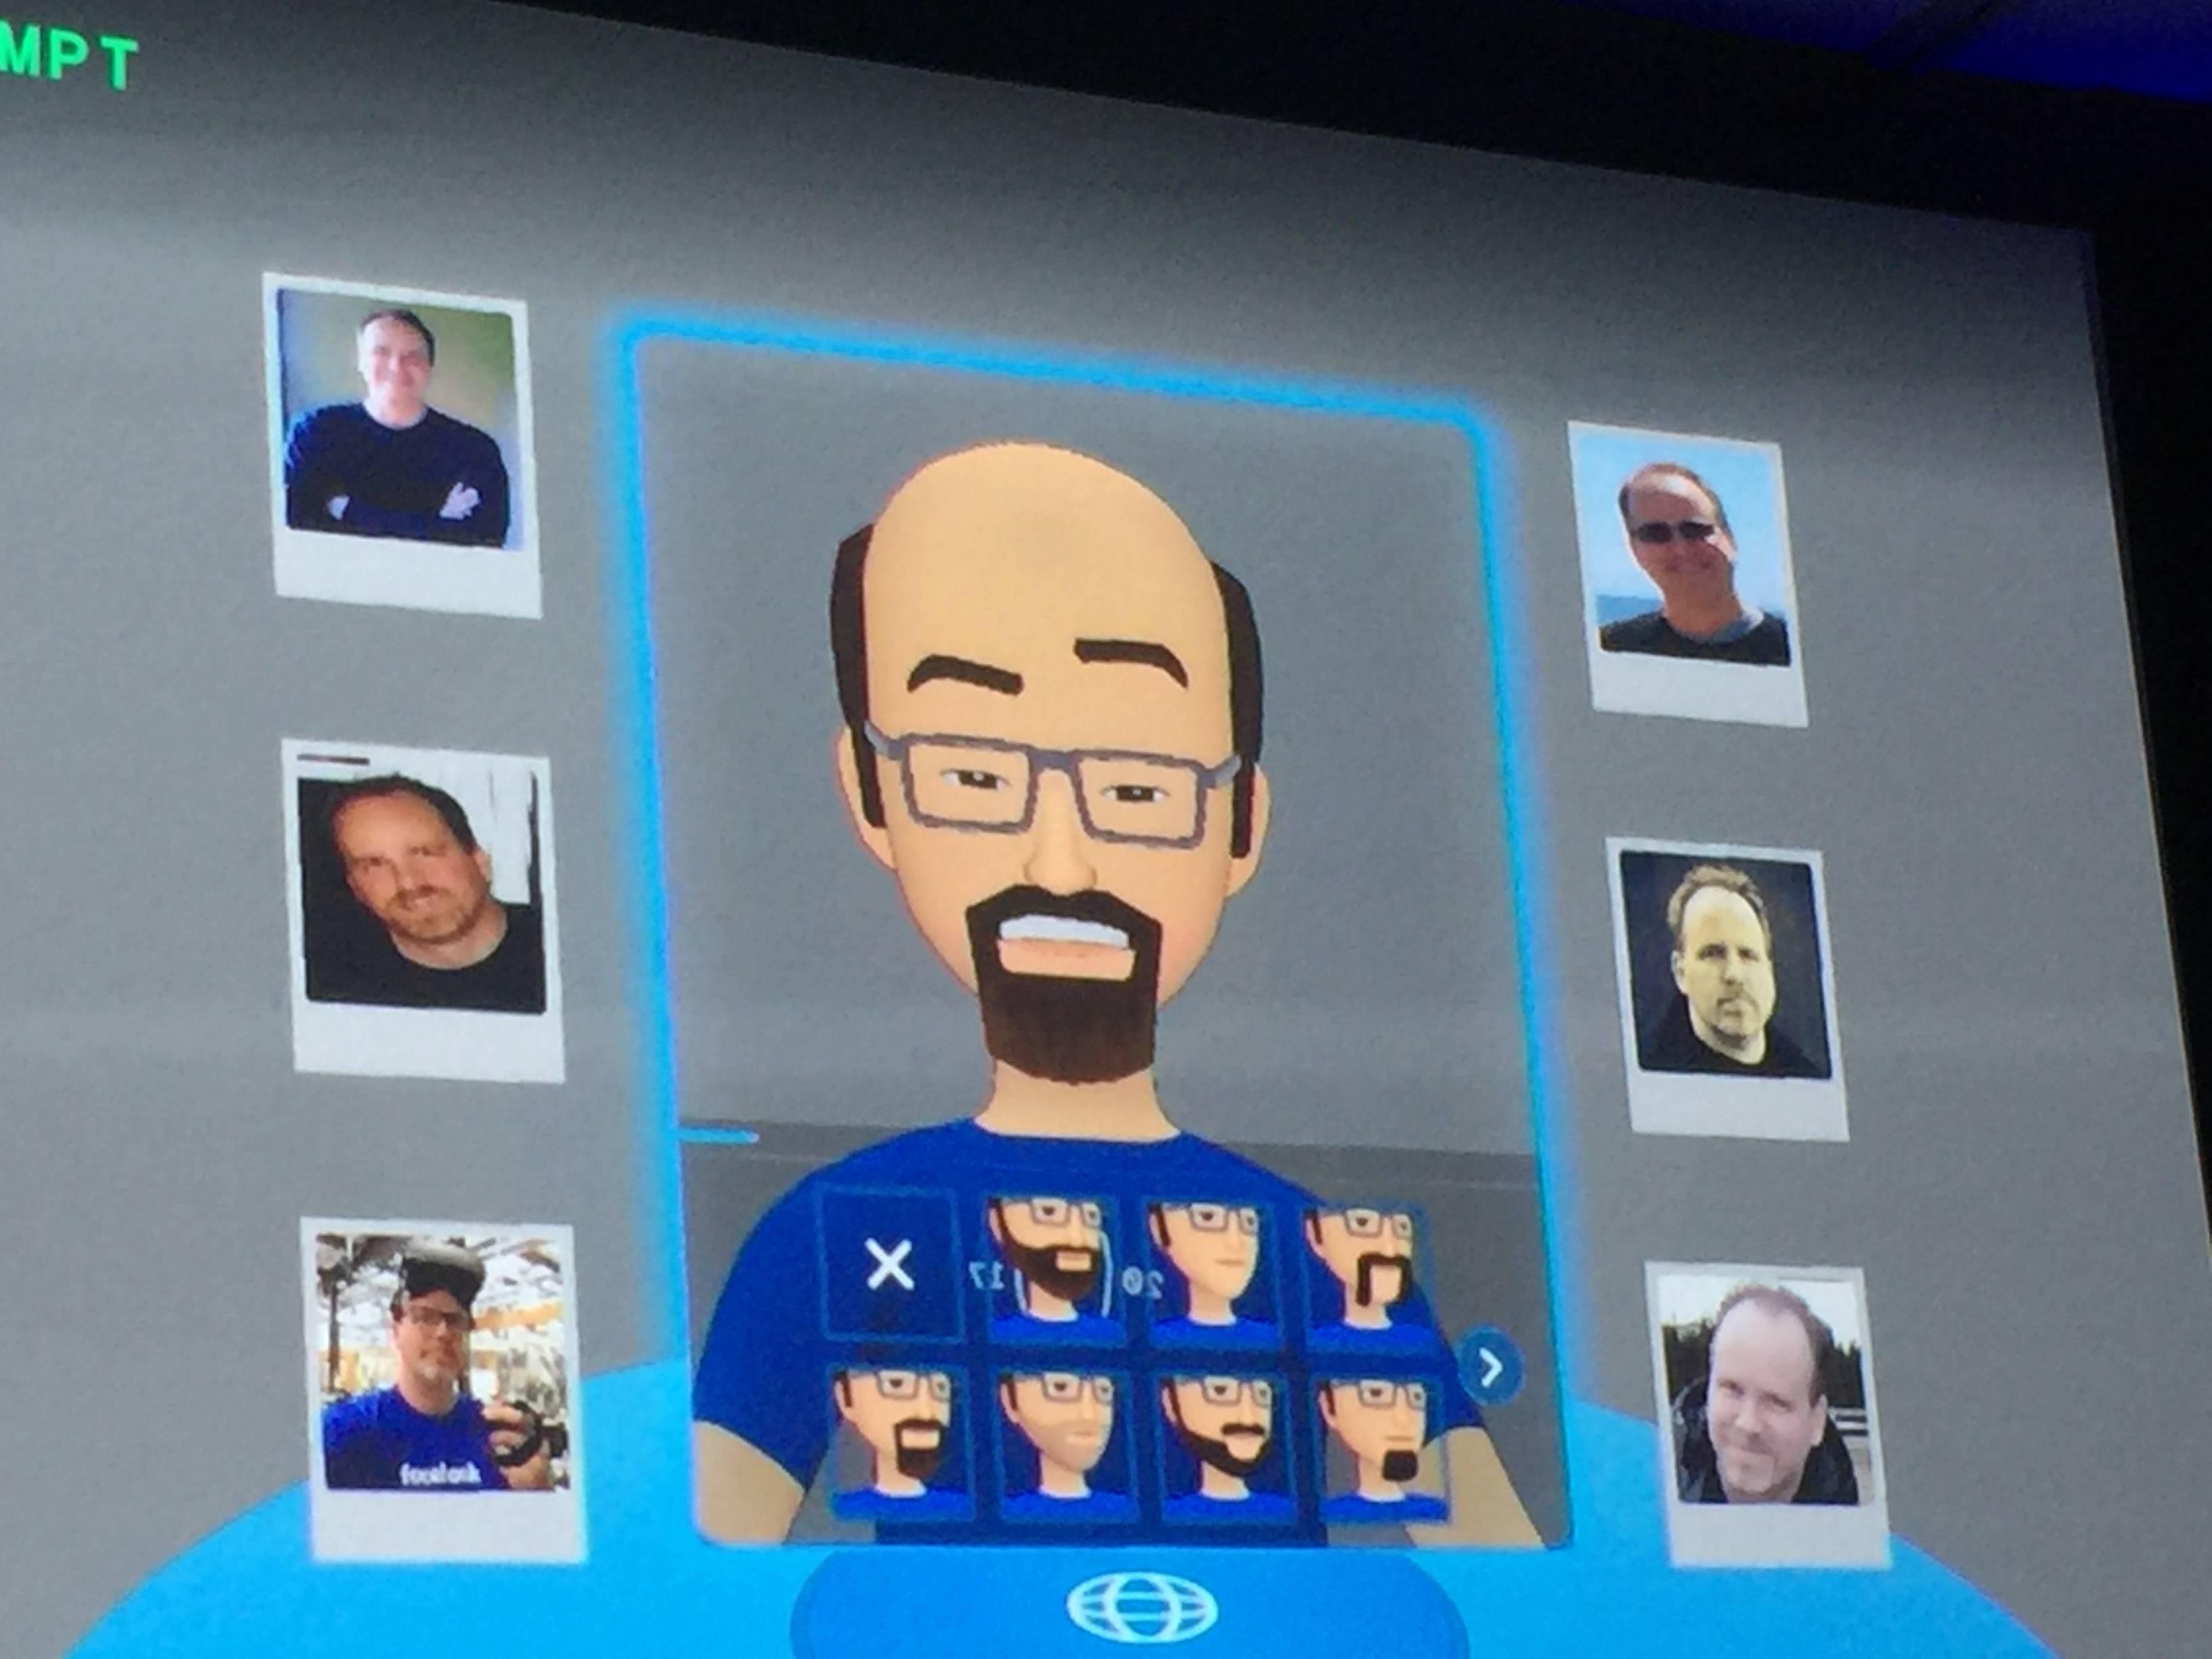 Facebook 最新推出的虚拟现实世界,简直好玩到炸裂